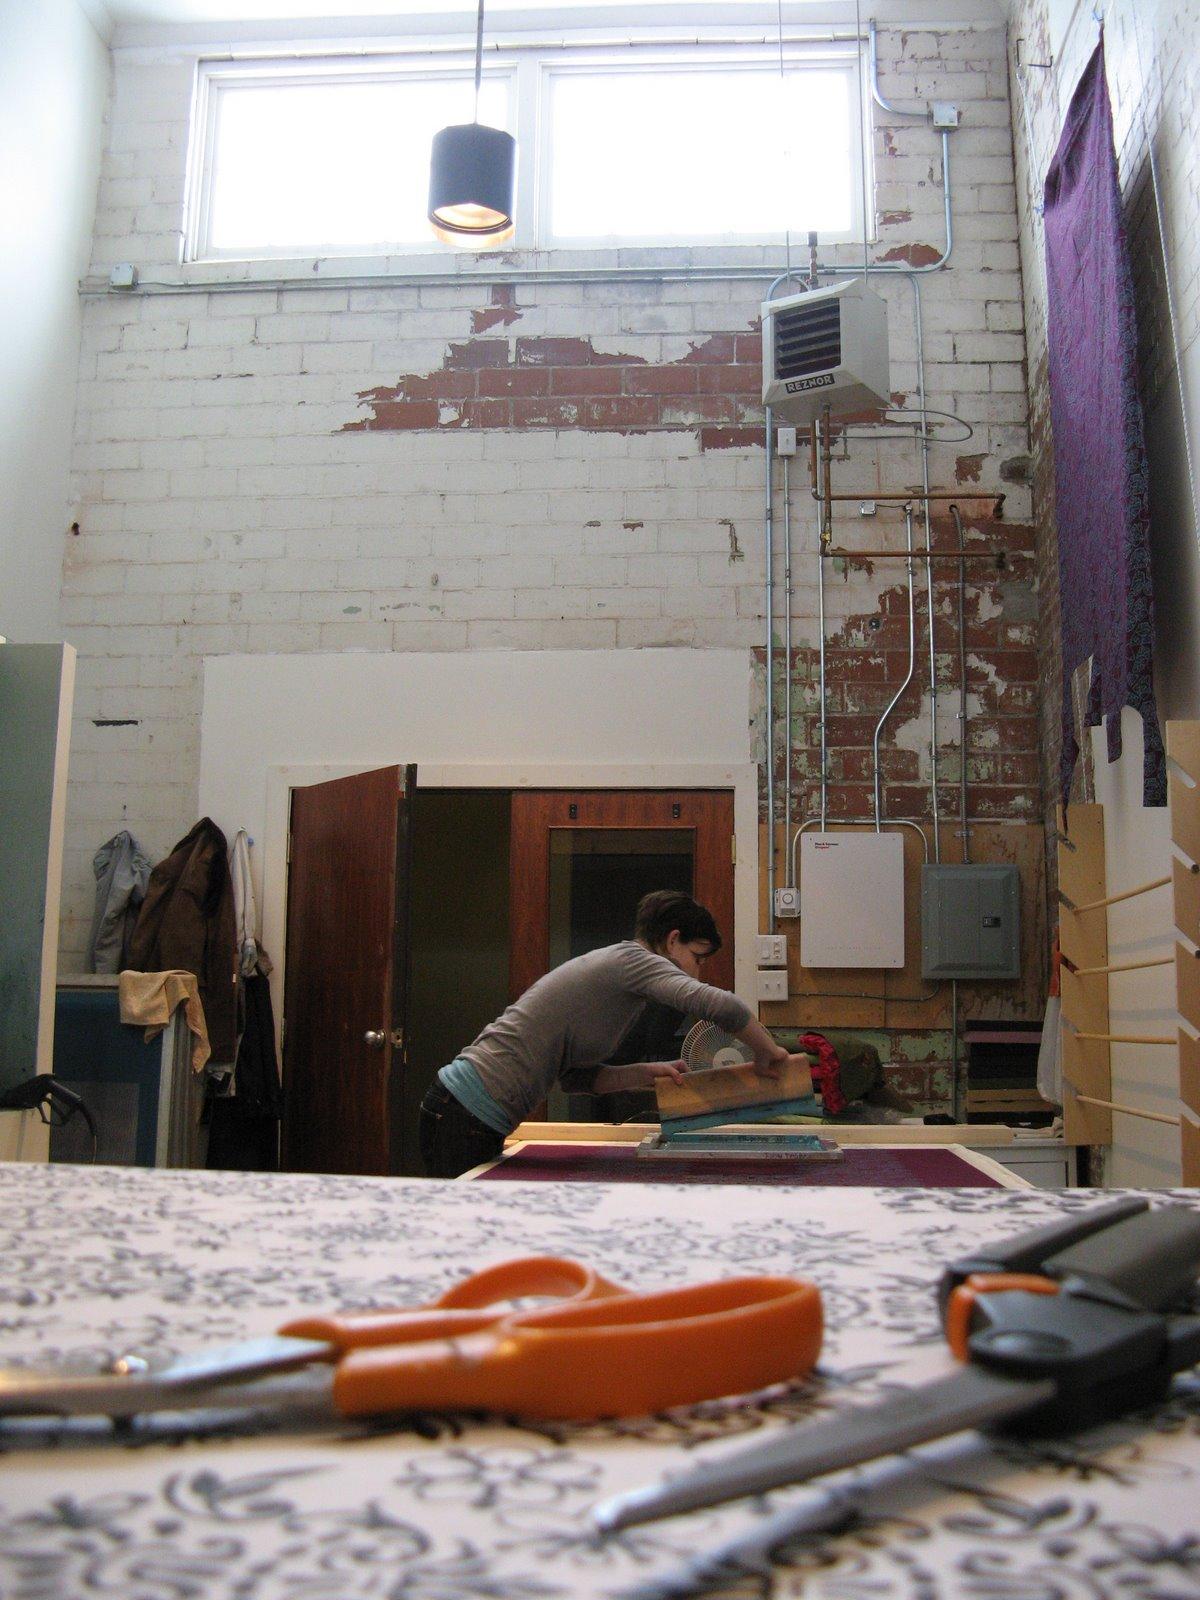 [studio+-+Feb+708+151.jpg]